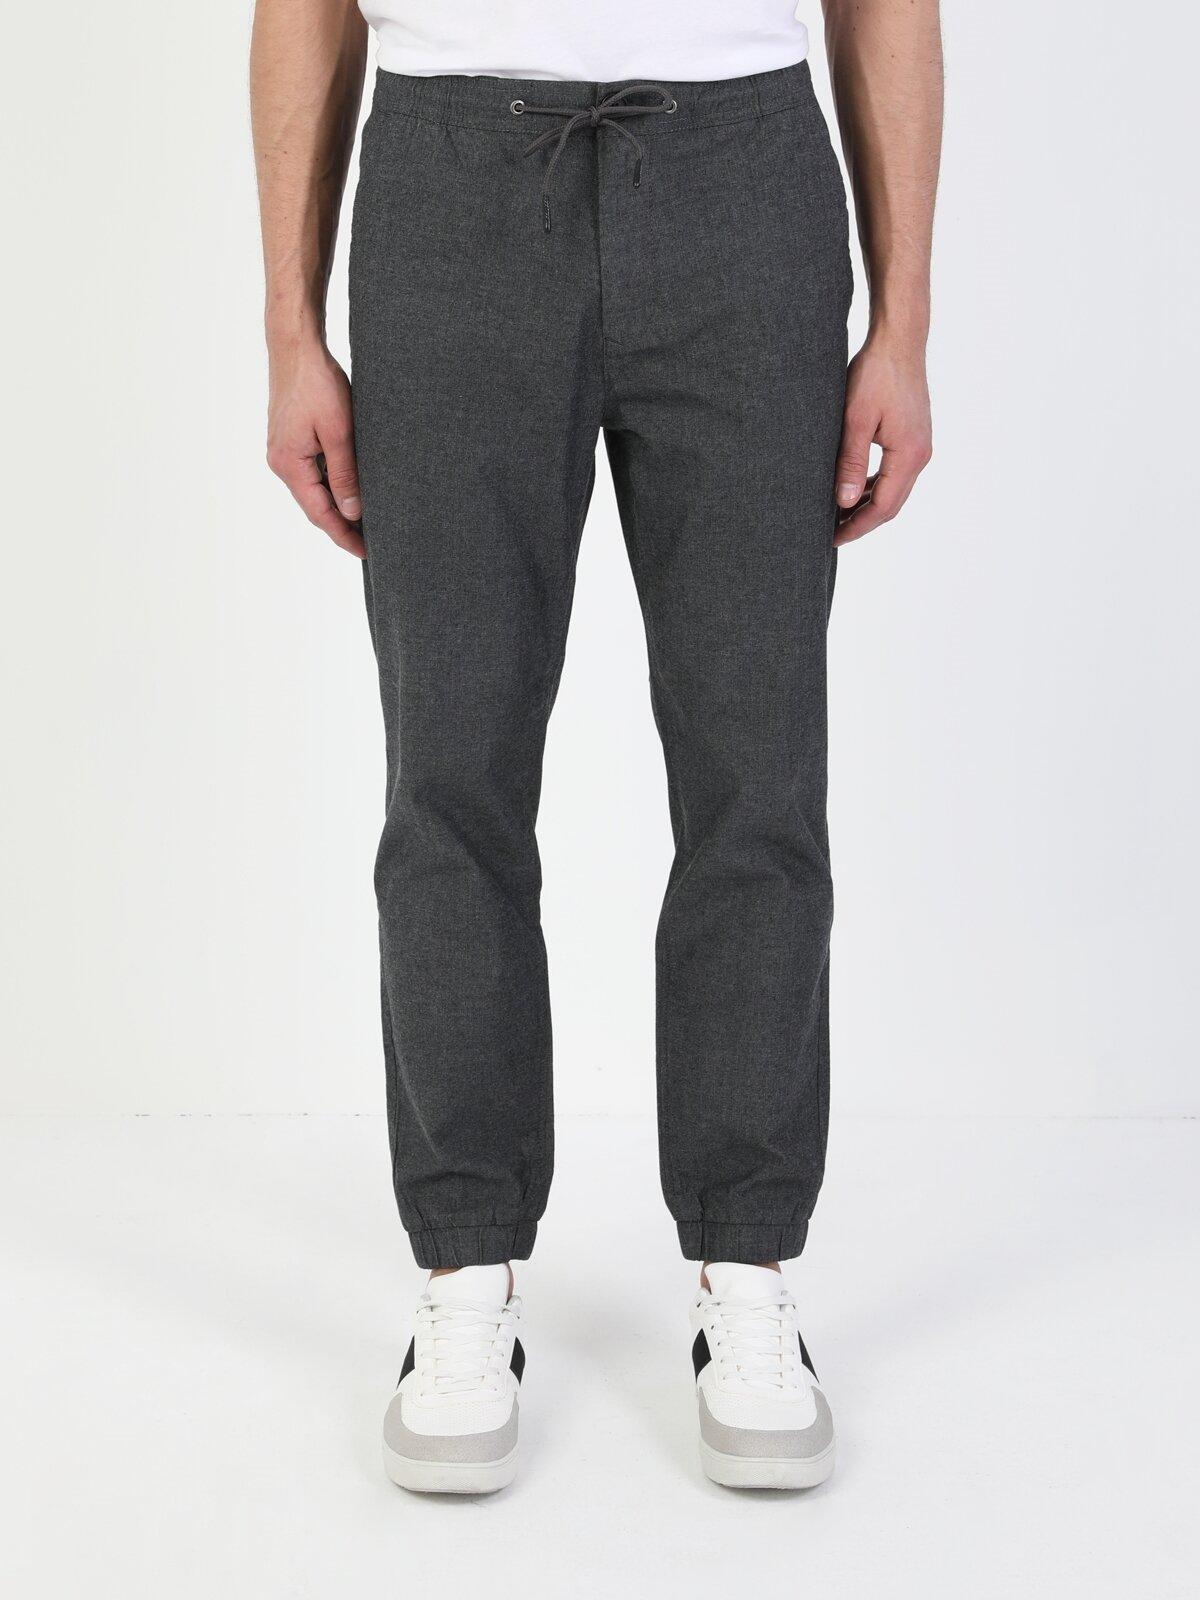 Slim Fit Orta Bel Lastikli  Erkek Antrasit Pantolon